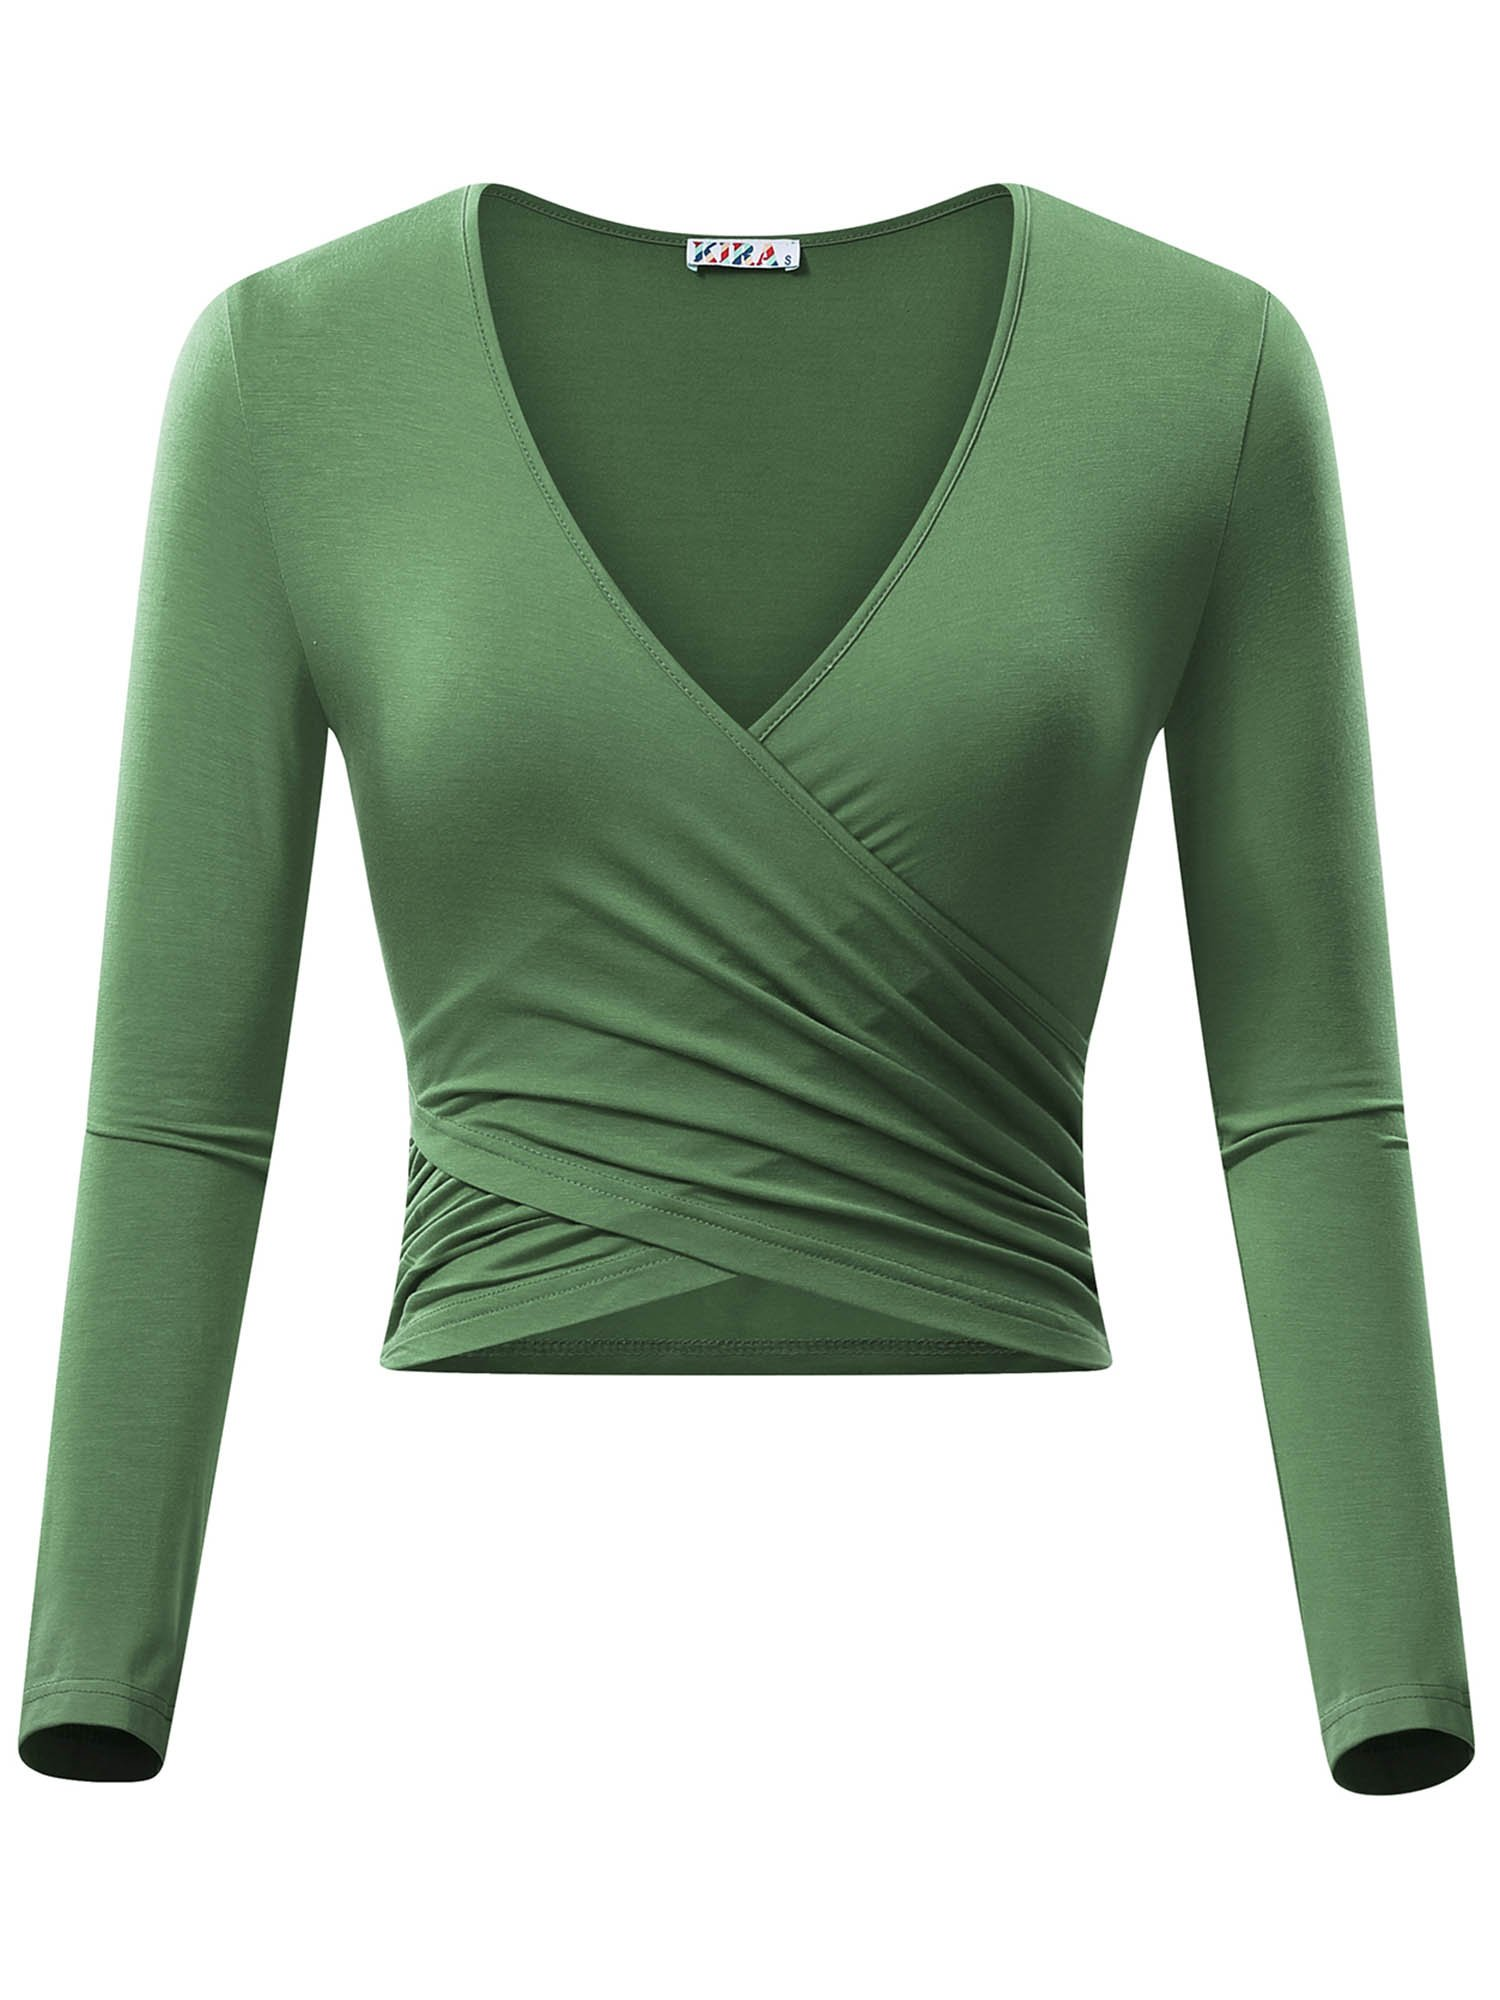 KIRA Women's Deep V Neck Long Sleeve Unique Cross Wrap Slim Fit Crop Tops(M,Army Green)